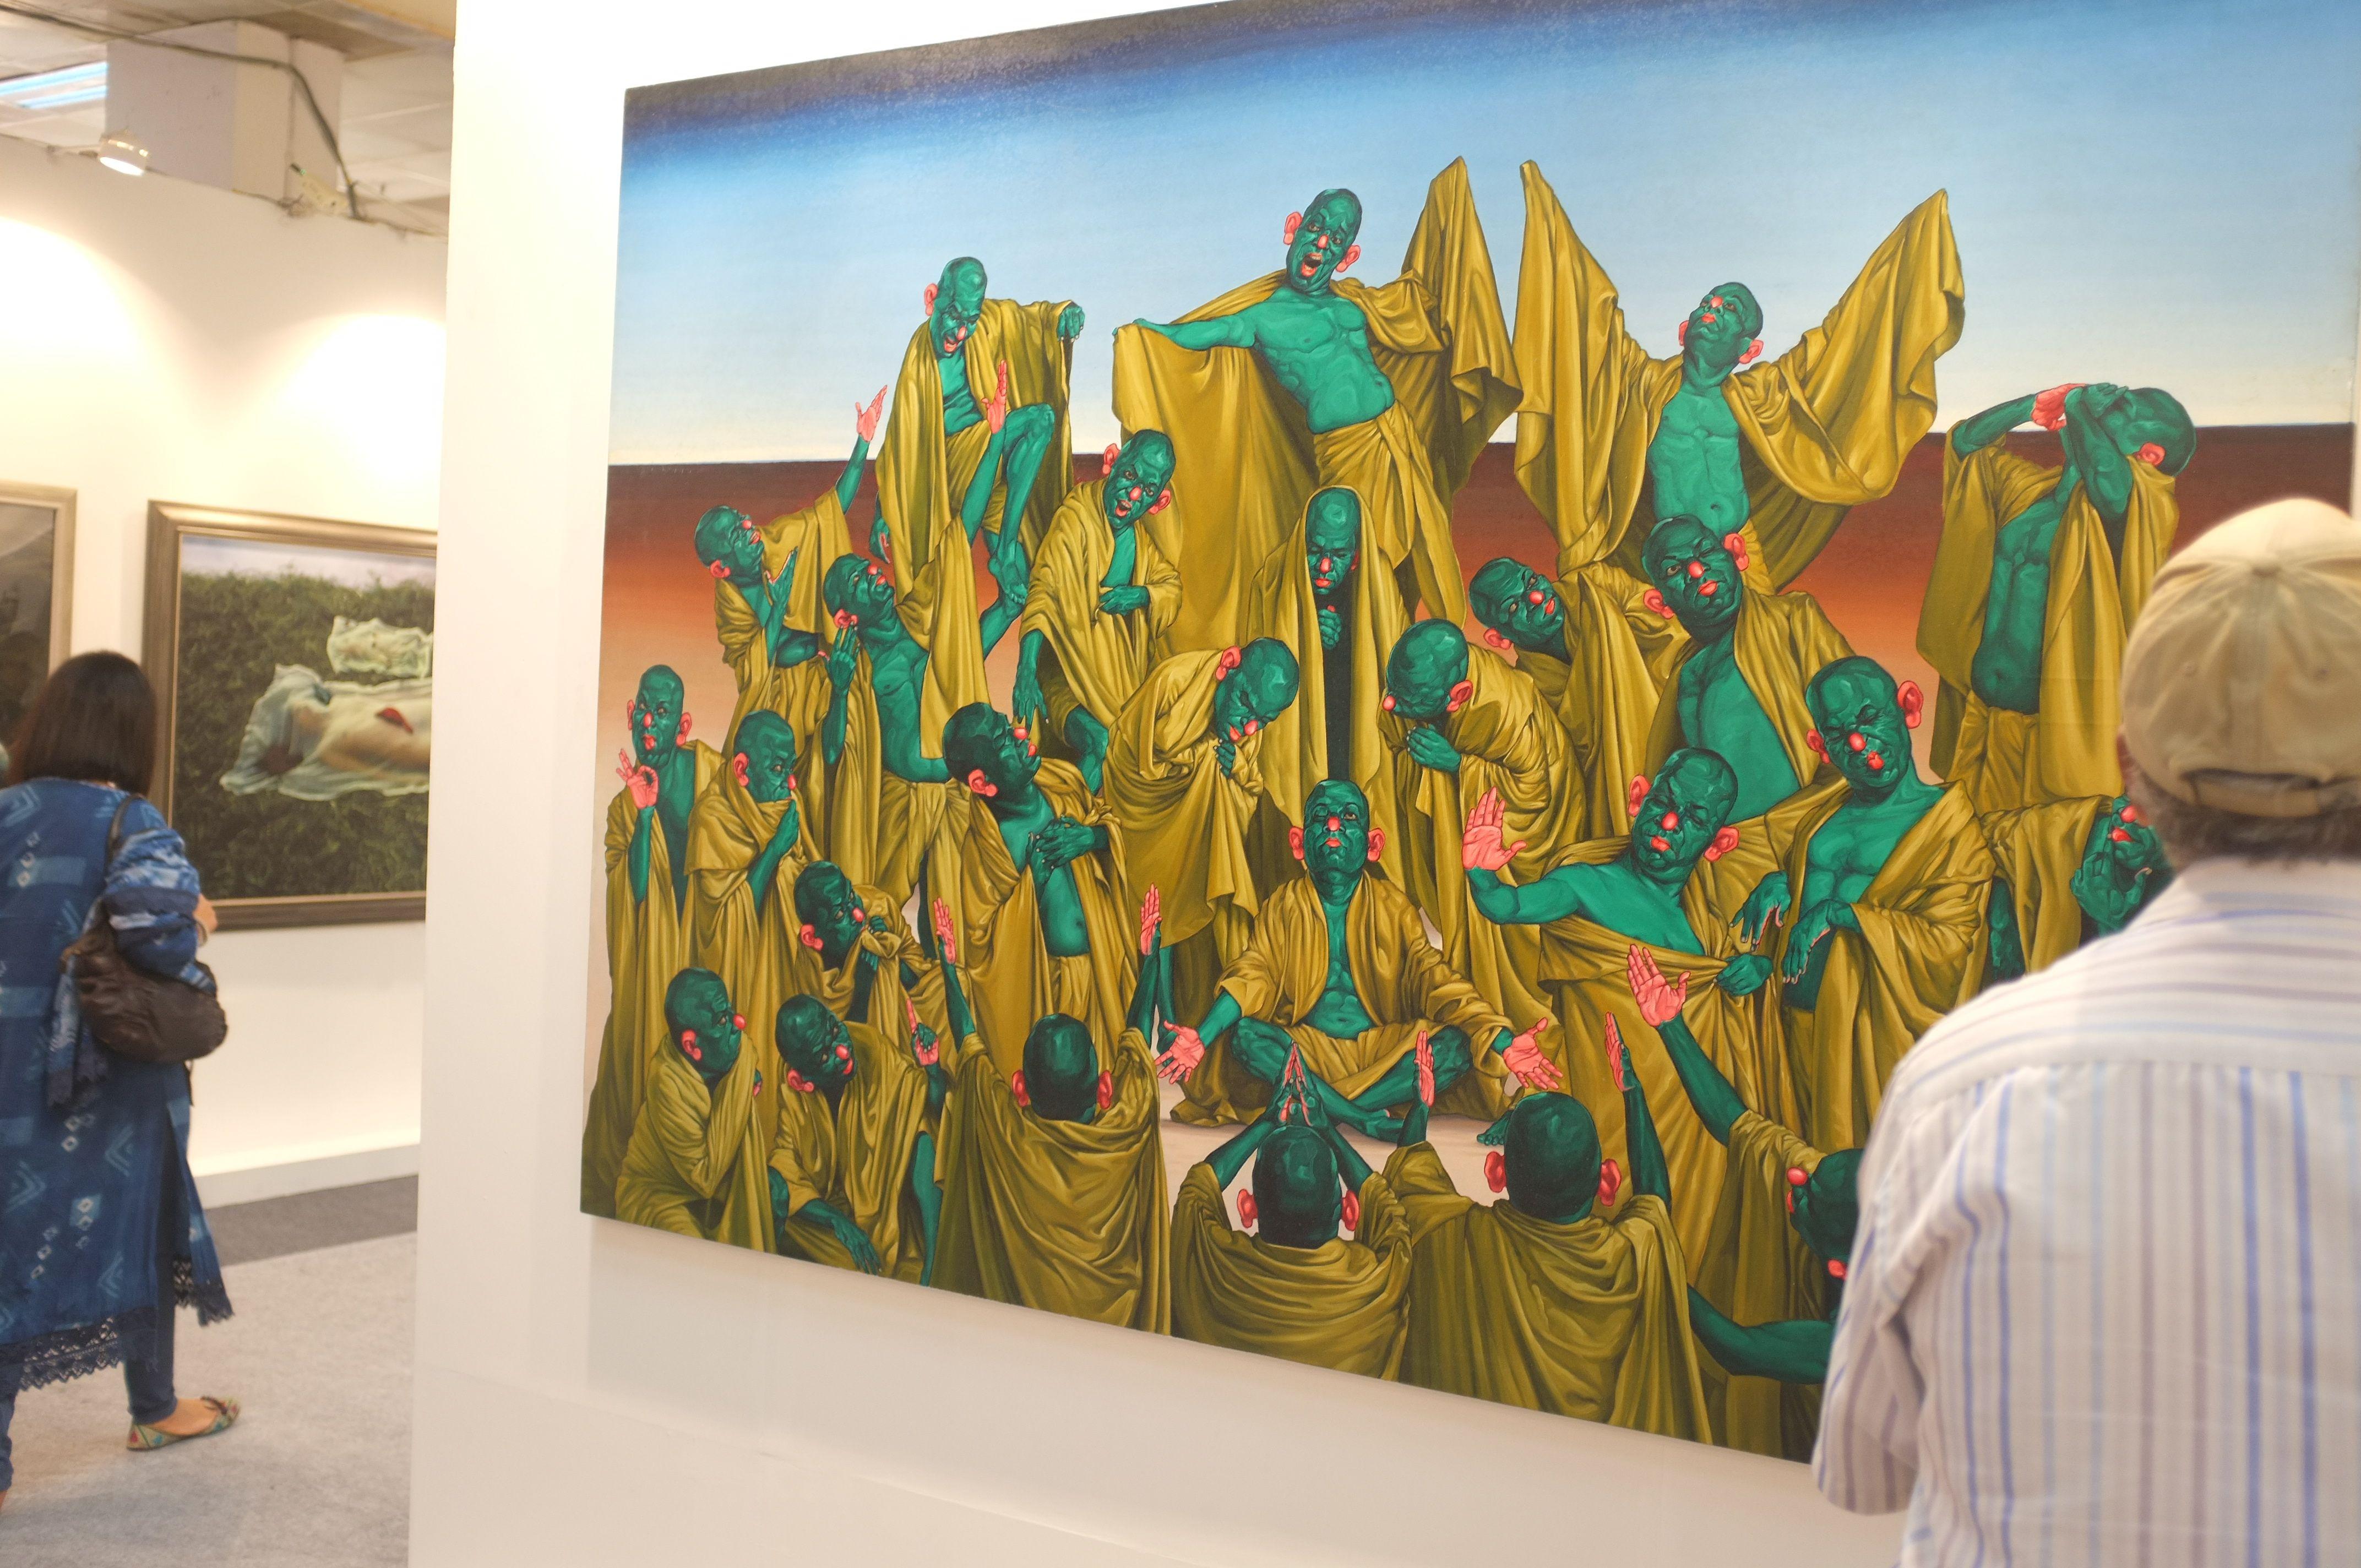 Art Fair captured by Akshay Chauhan